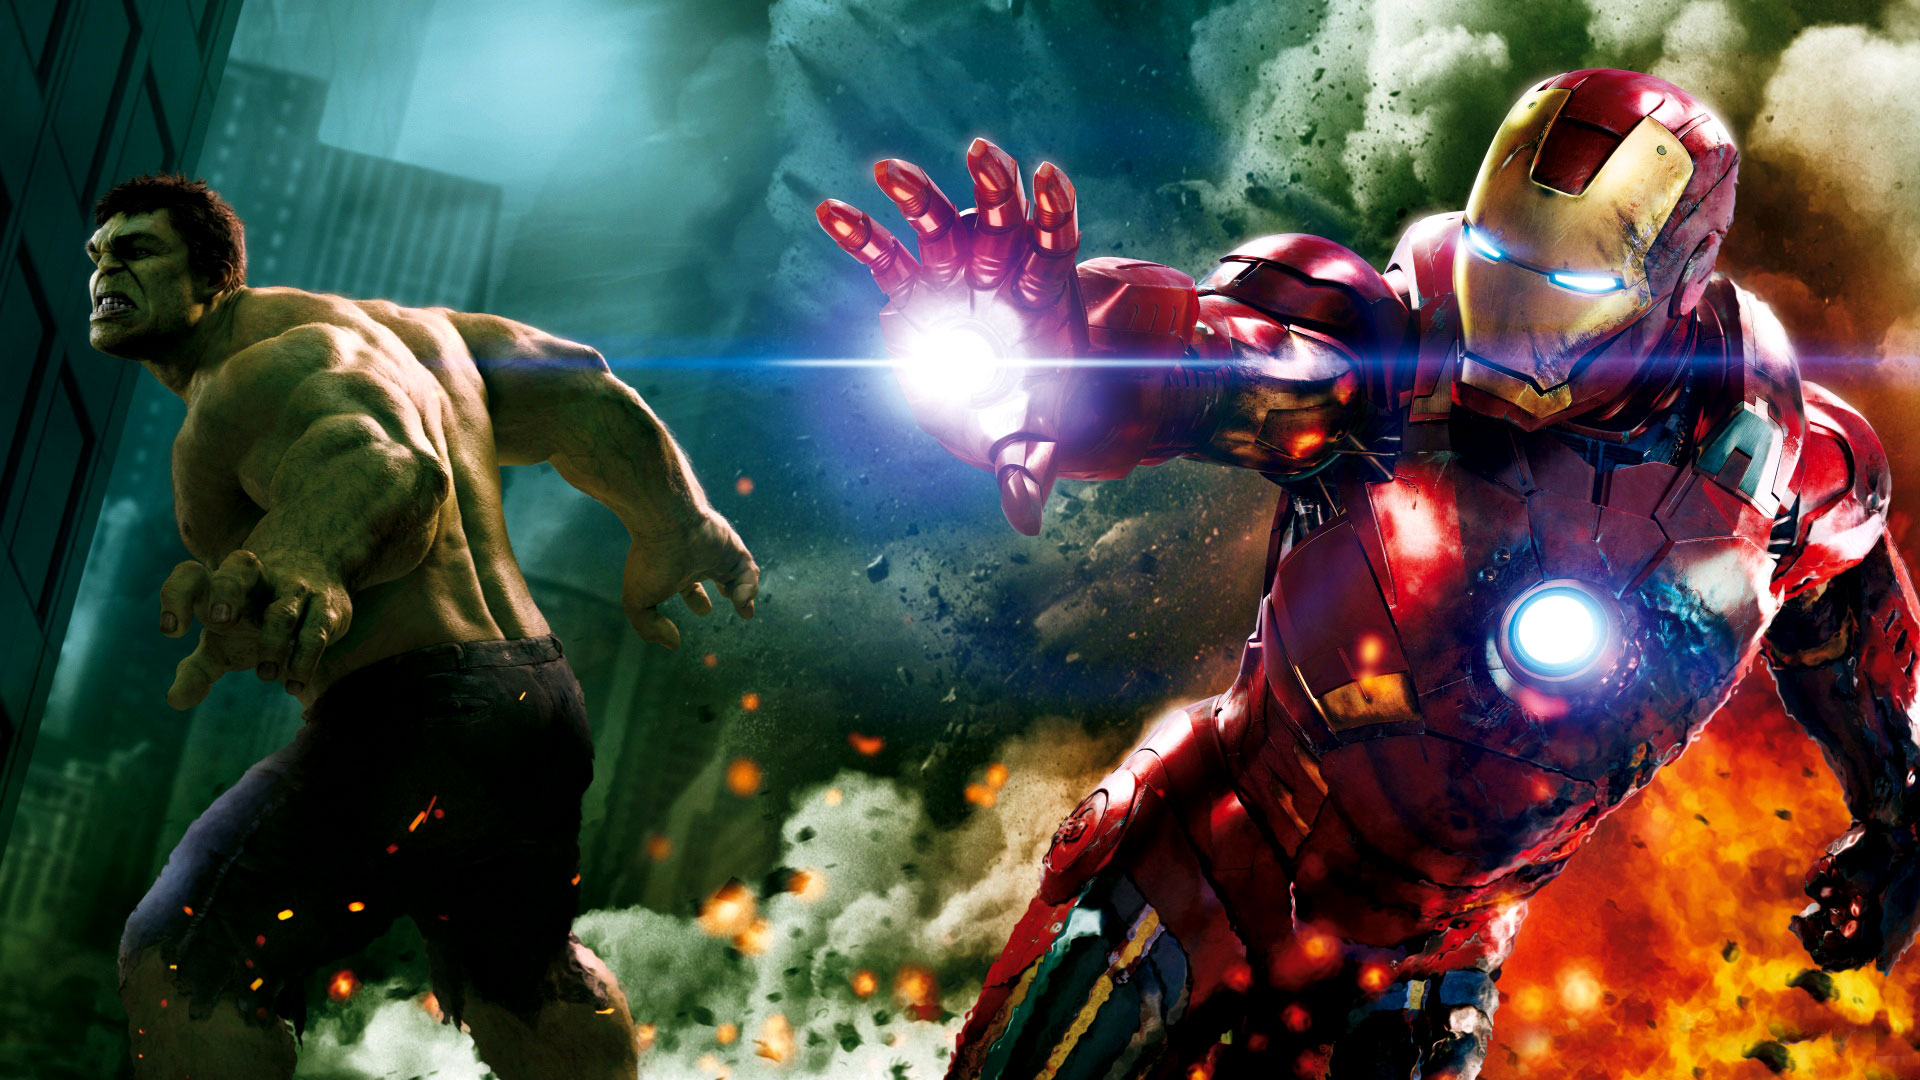 Marvel heroes 2015 ionic gamers marvel heroes es un free to play